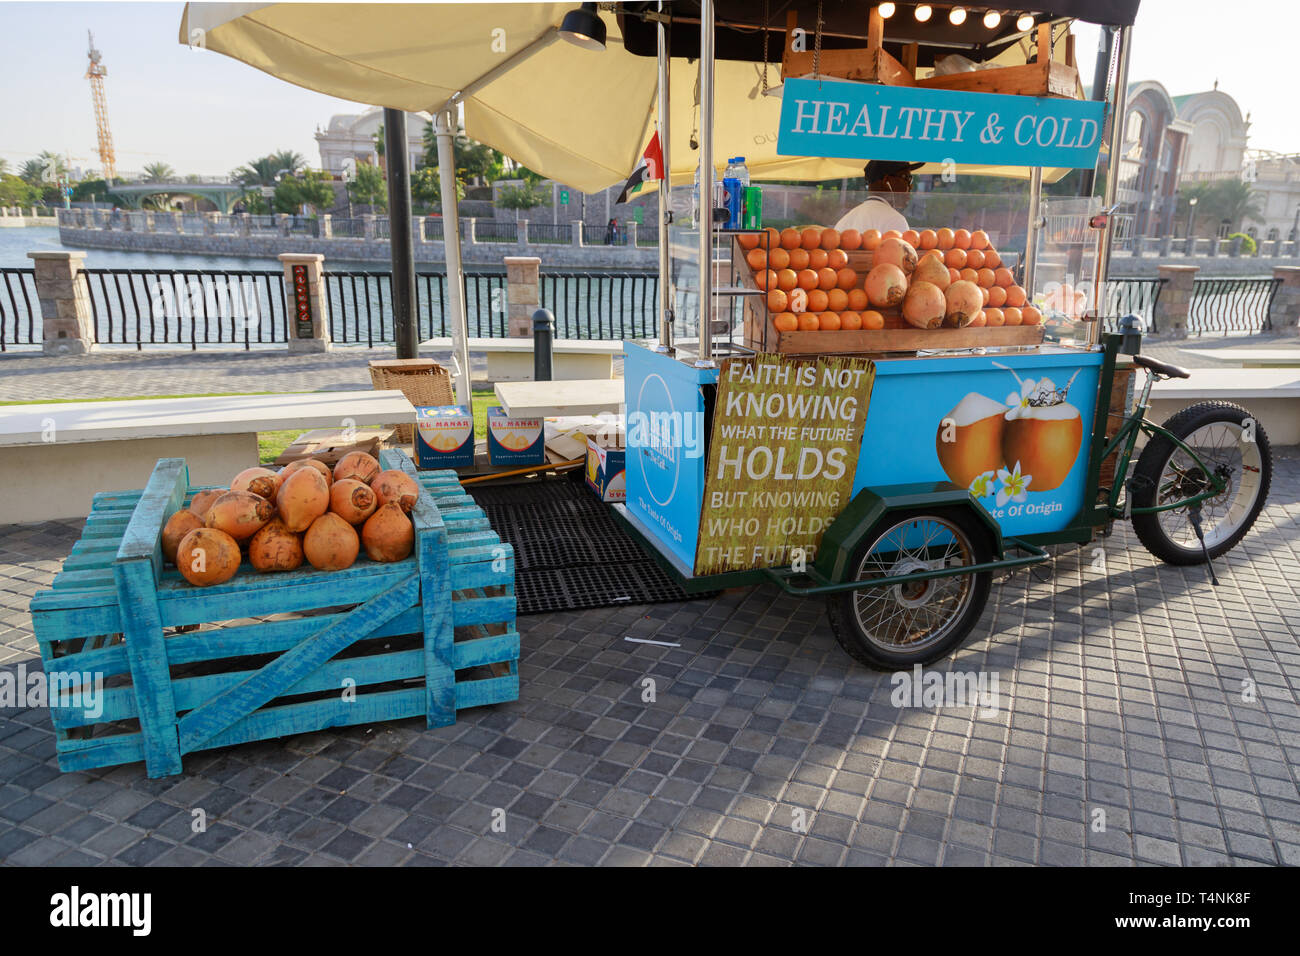 Fruit Stall Emirates Stock Photos & Fruit Stall Emirates